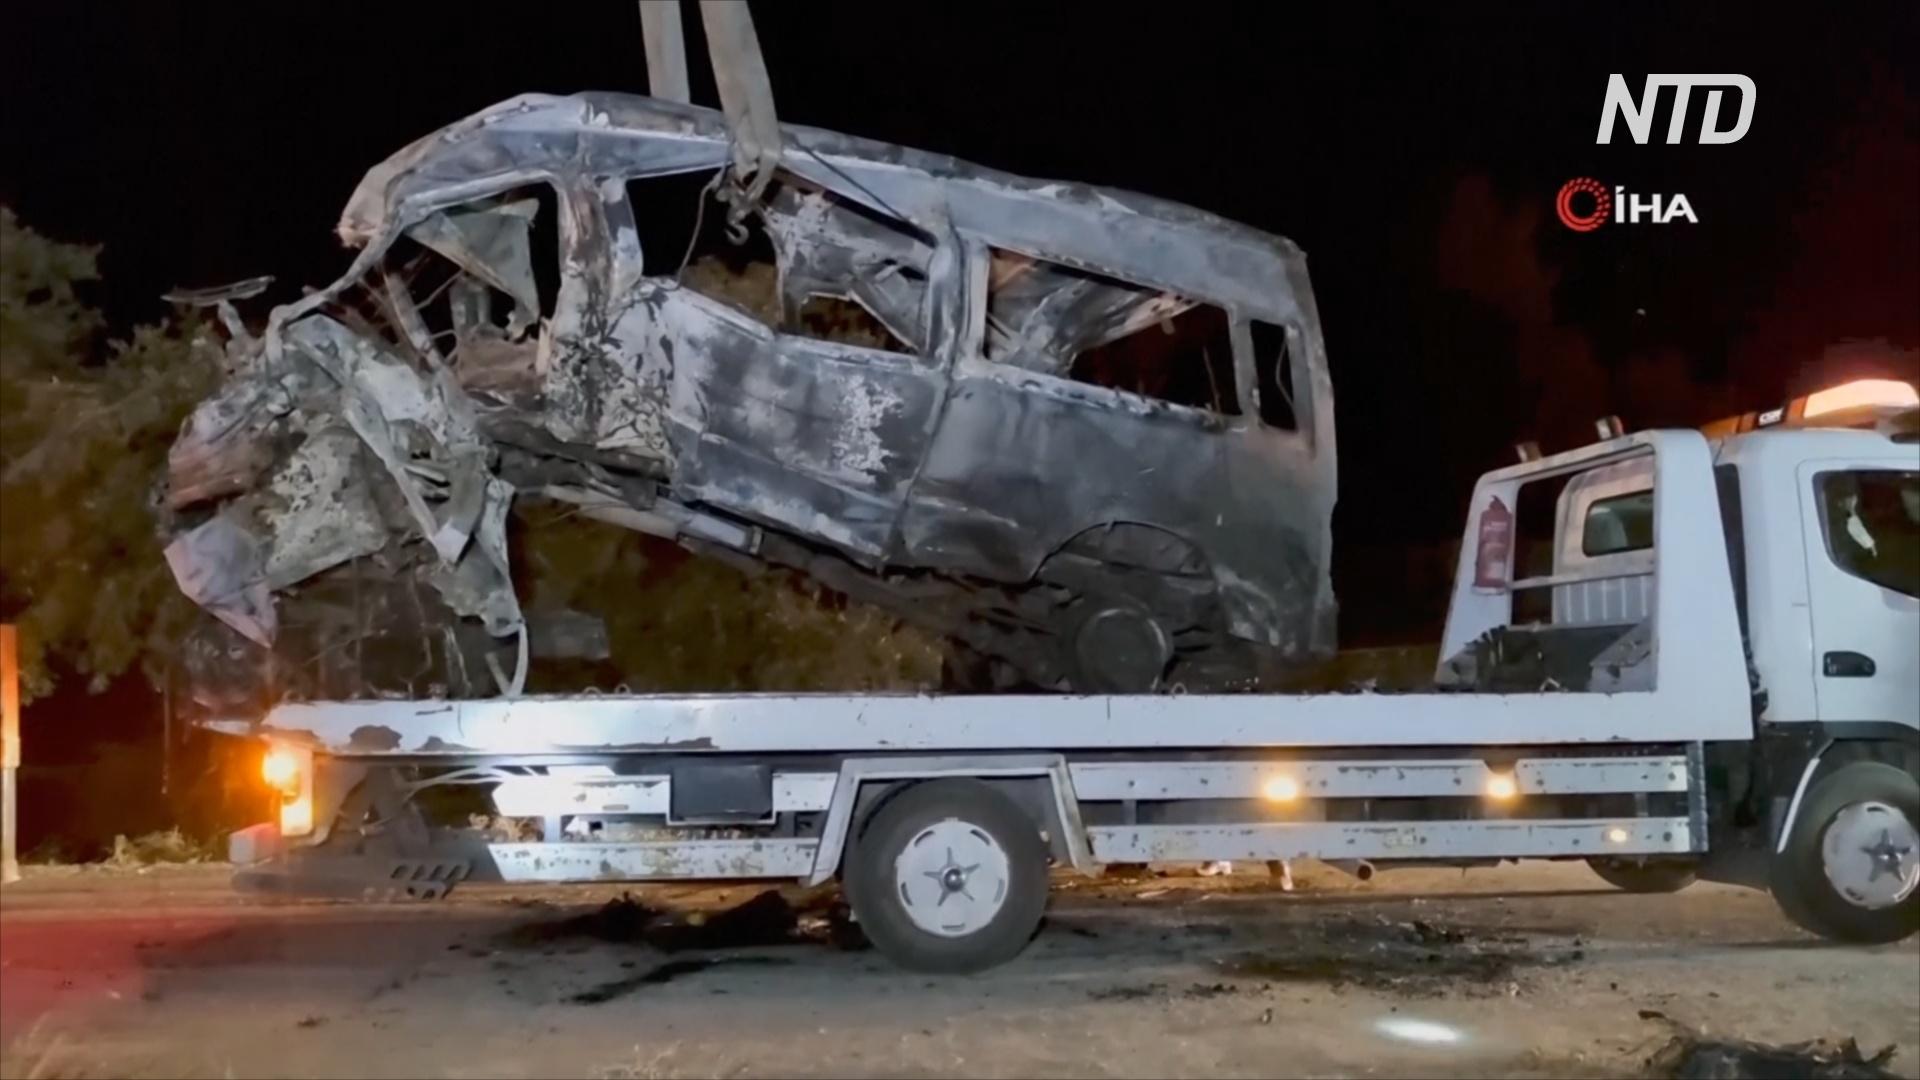 ДТП в Турции: разбился микроавтобус с мигрантами